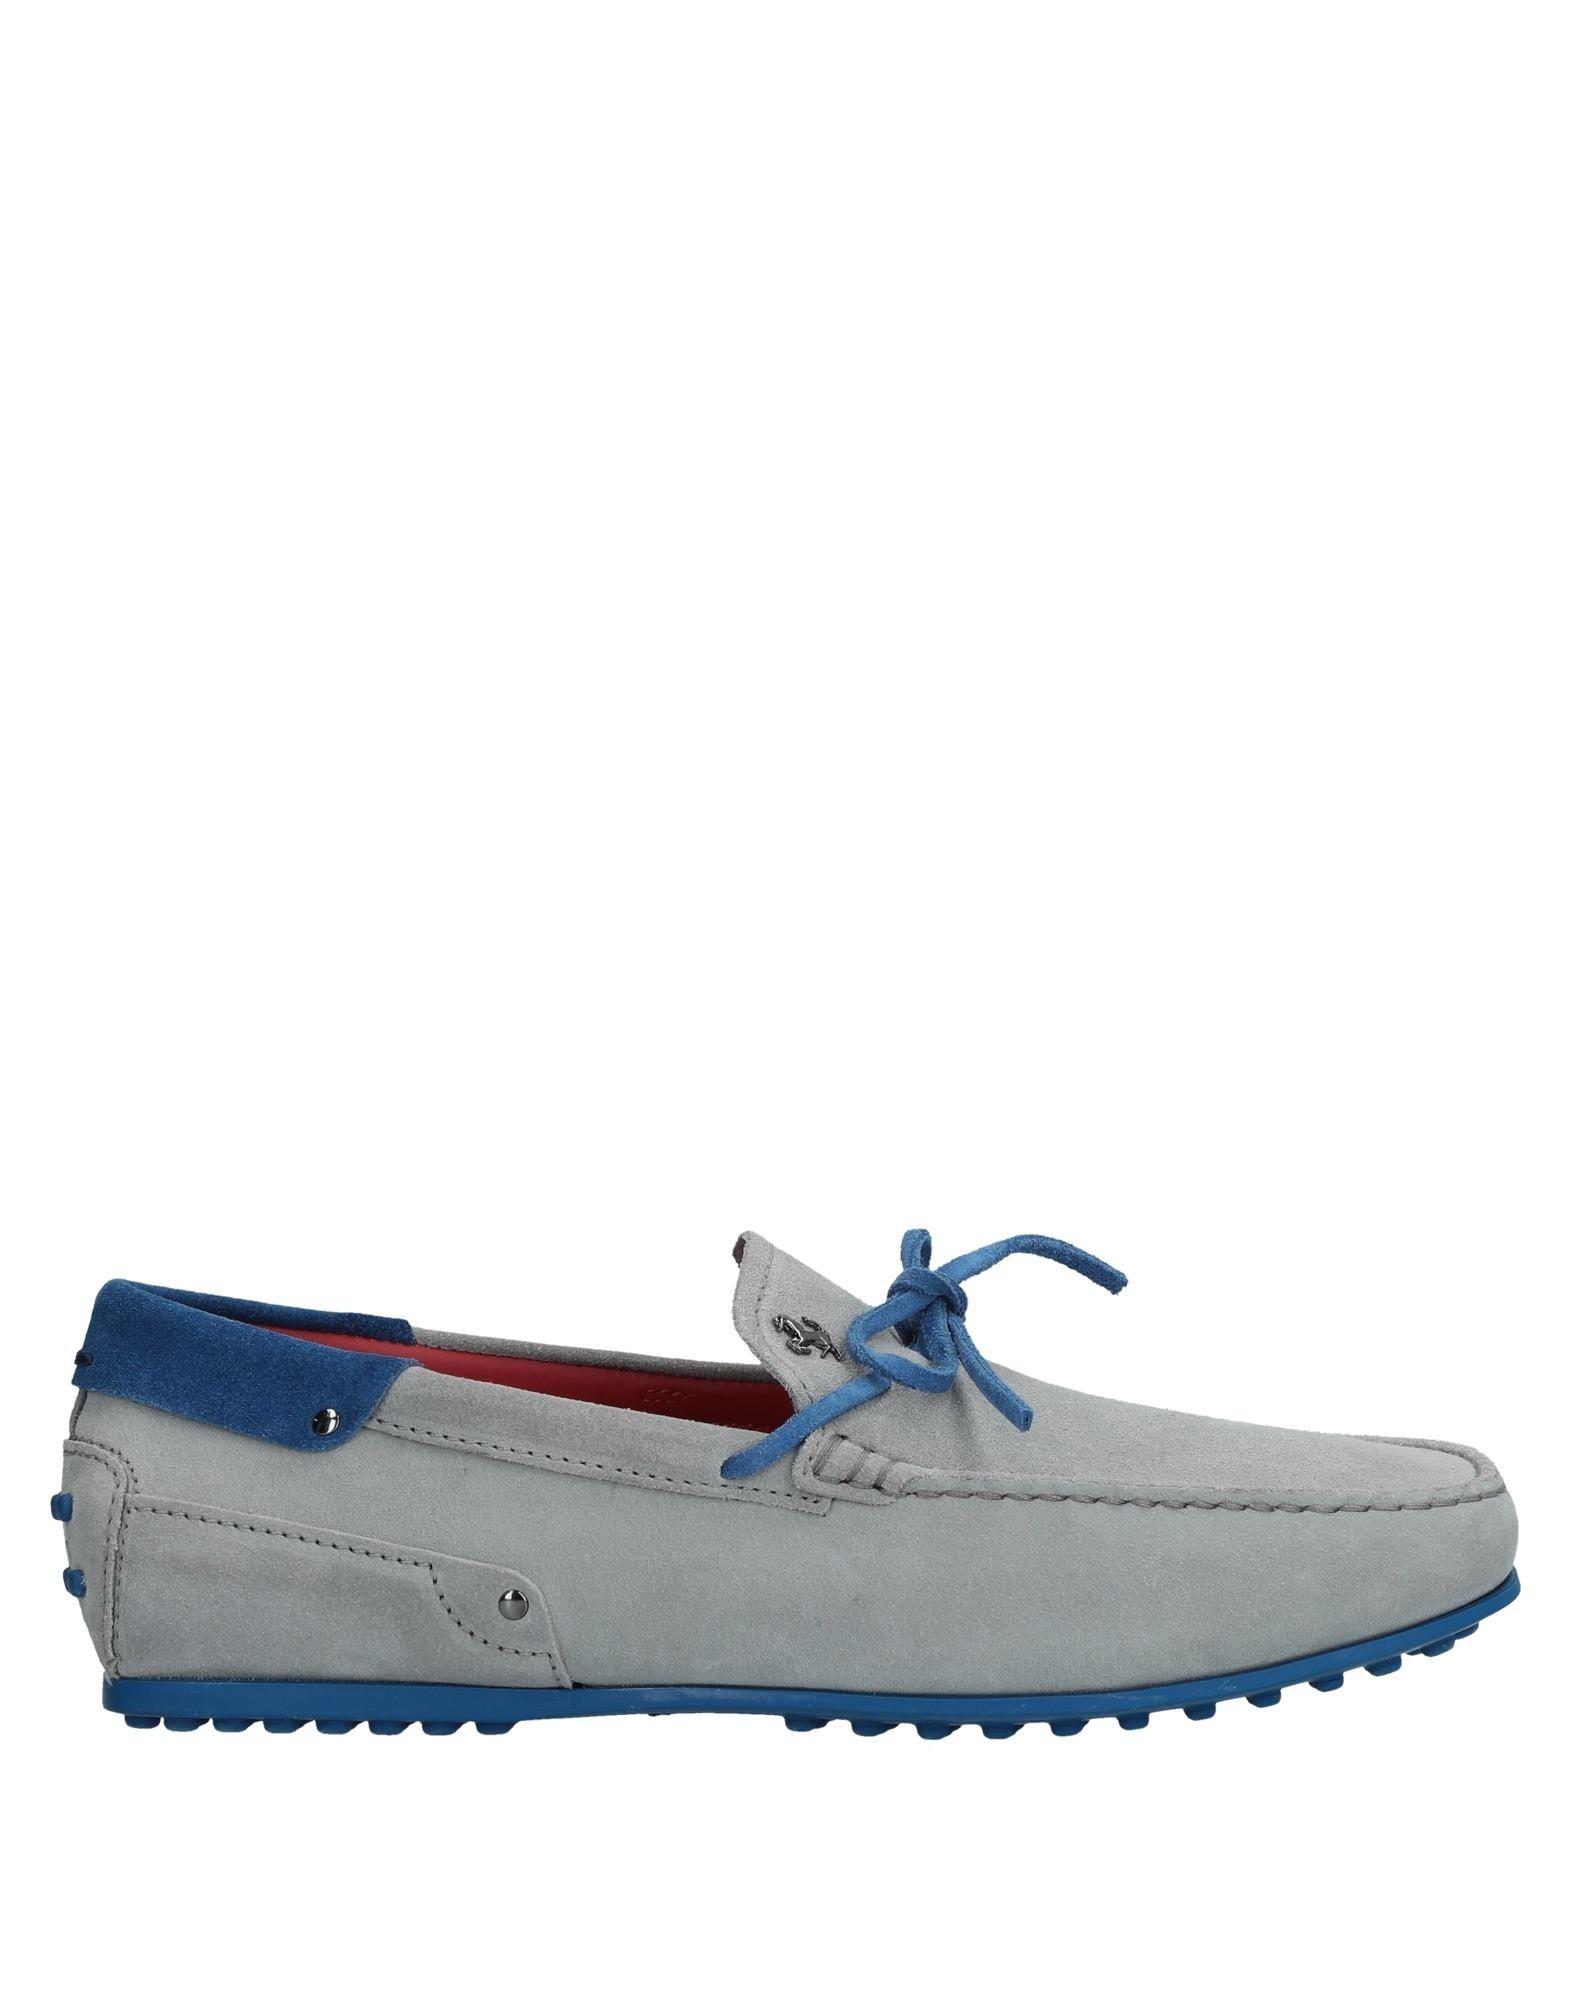 Tod's Mokassins Herren  11541668JB Gute Qualität beliebte Schuhe